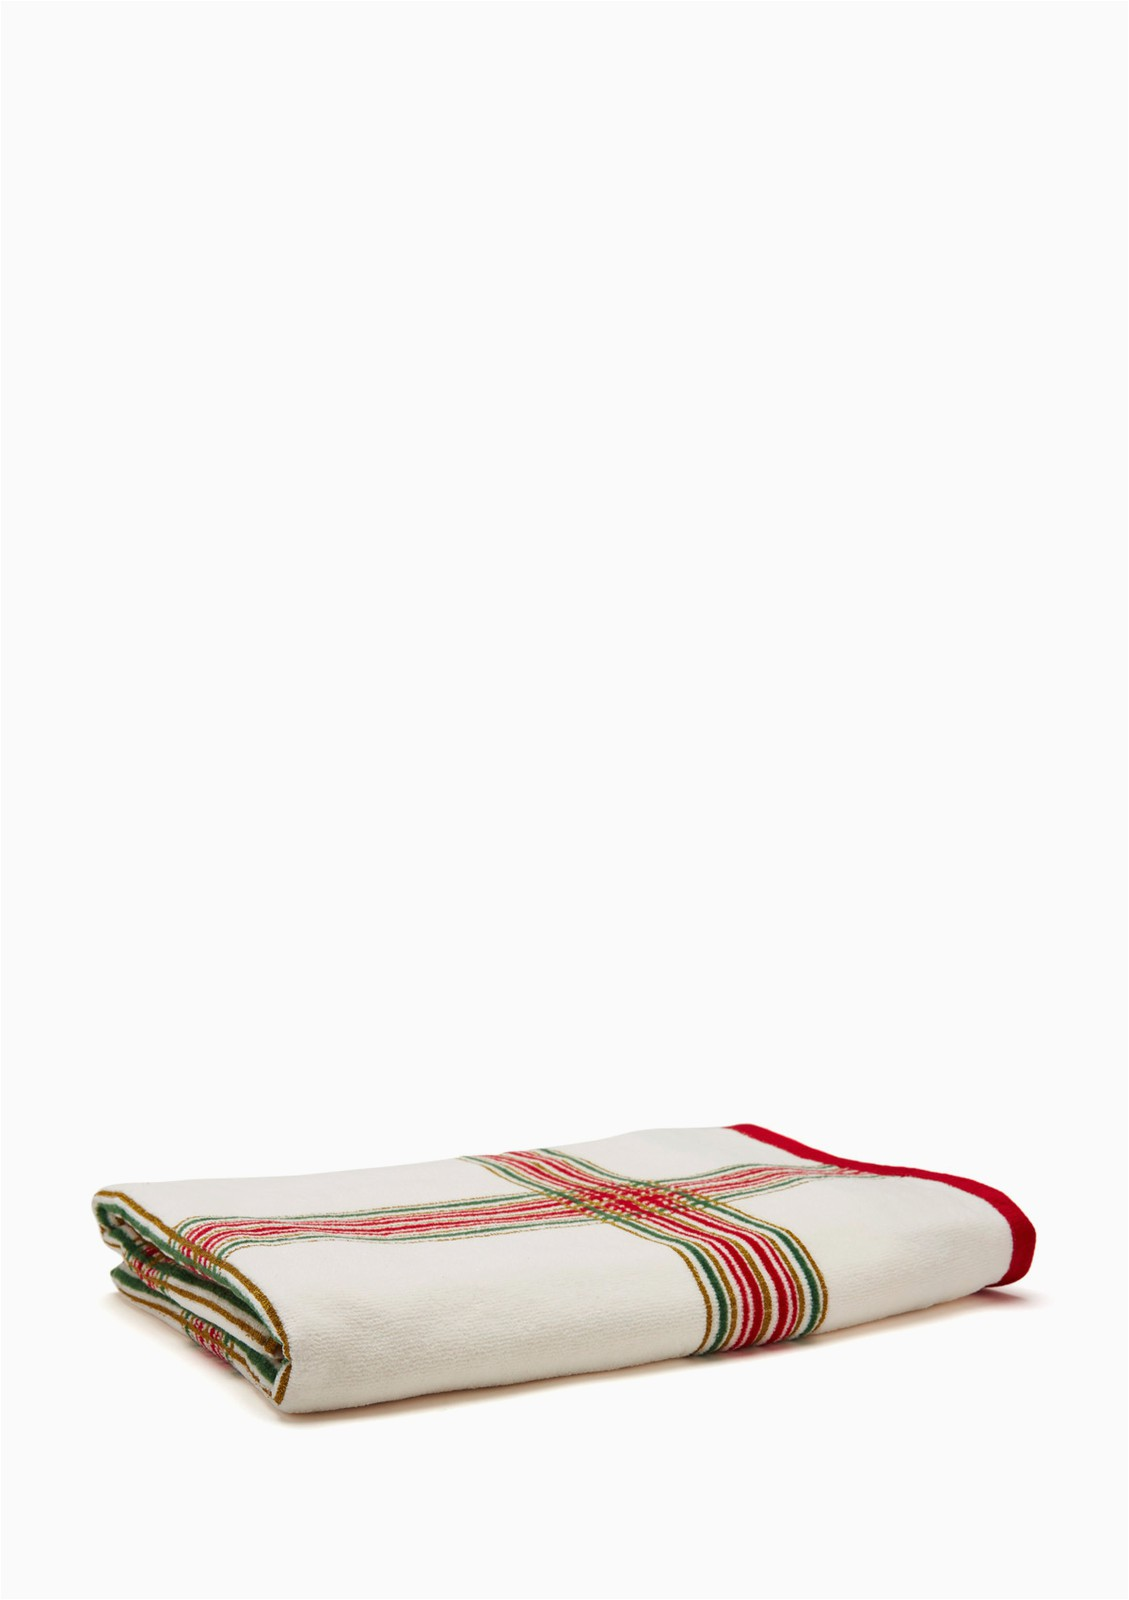 Lenox Holiday Bath Rug Lenox Holiday Nouveau Plaid Christmas Bath towel Walmart